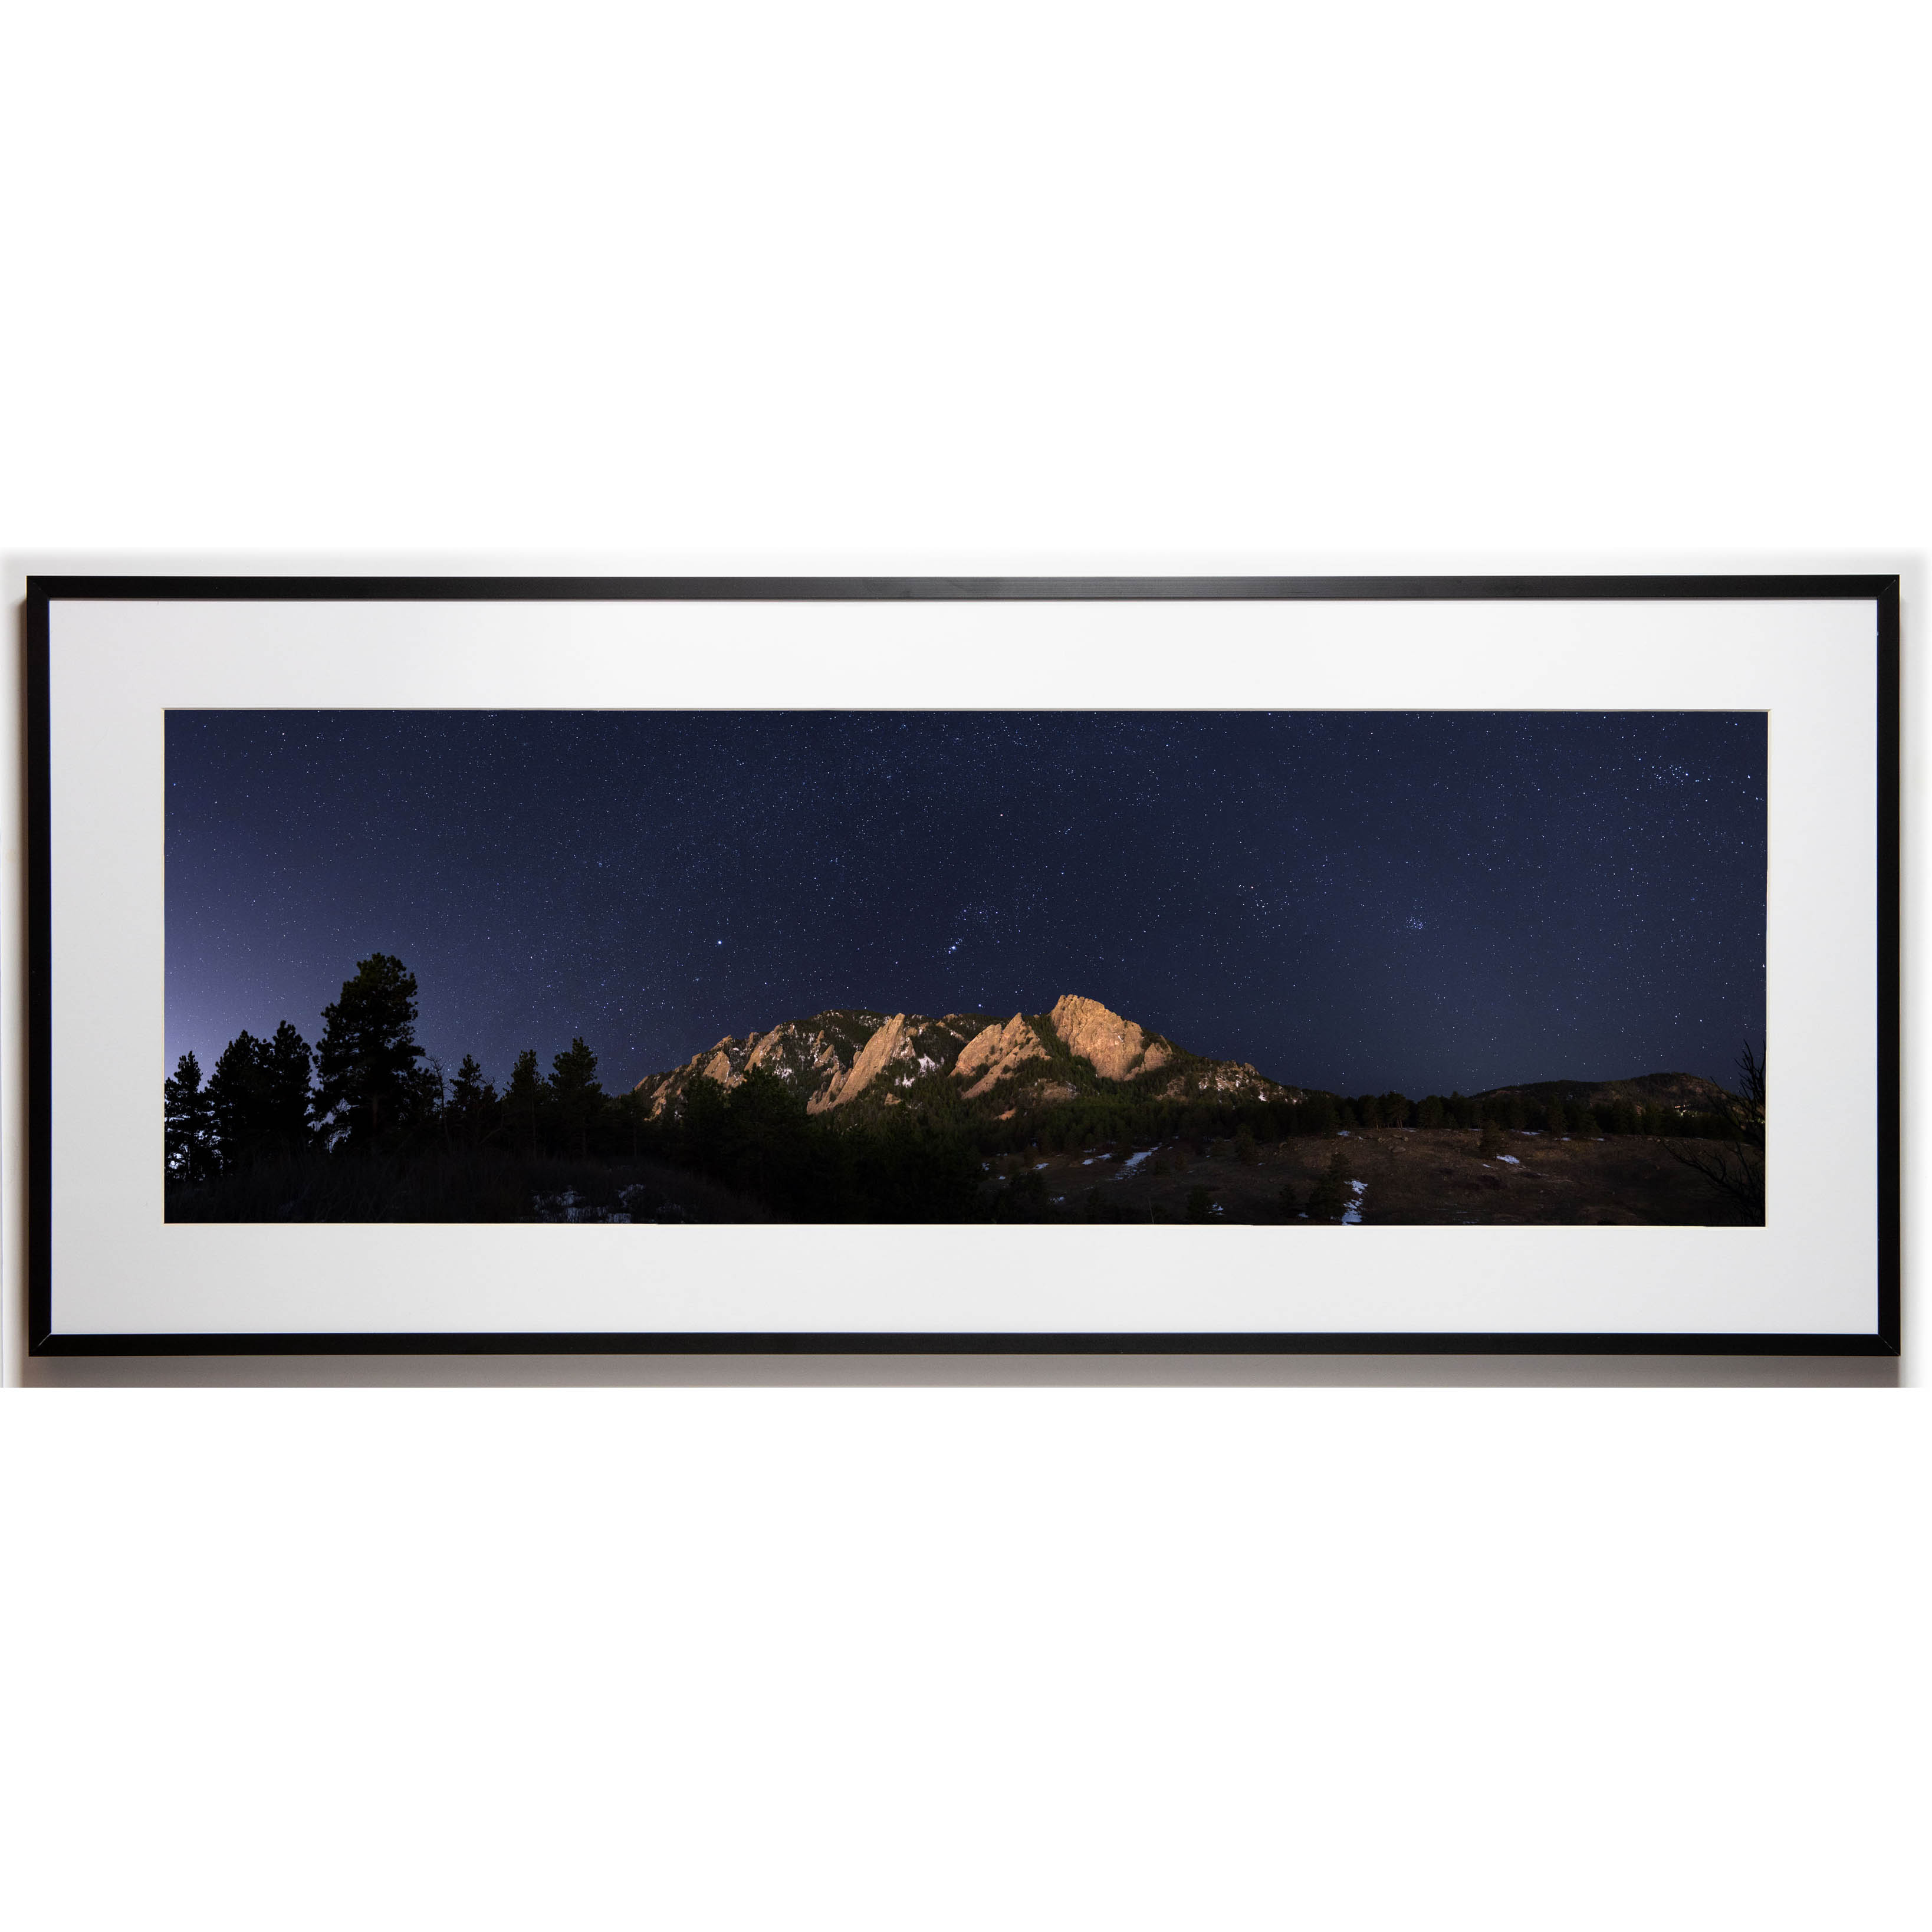 Cullis 10x30 framed - Flatirons Stars cropped